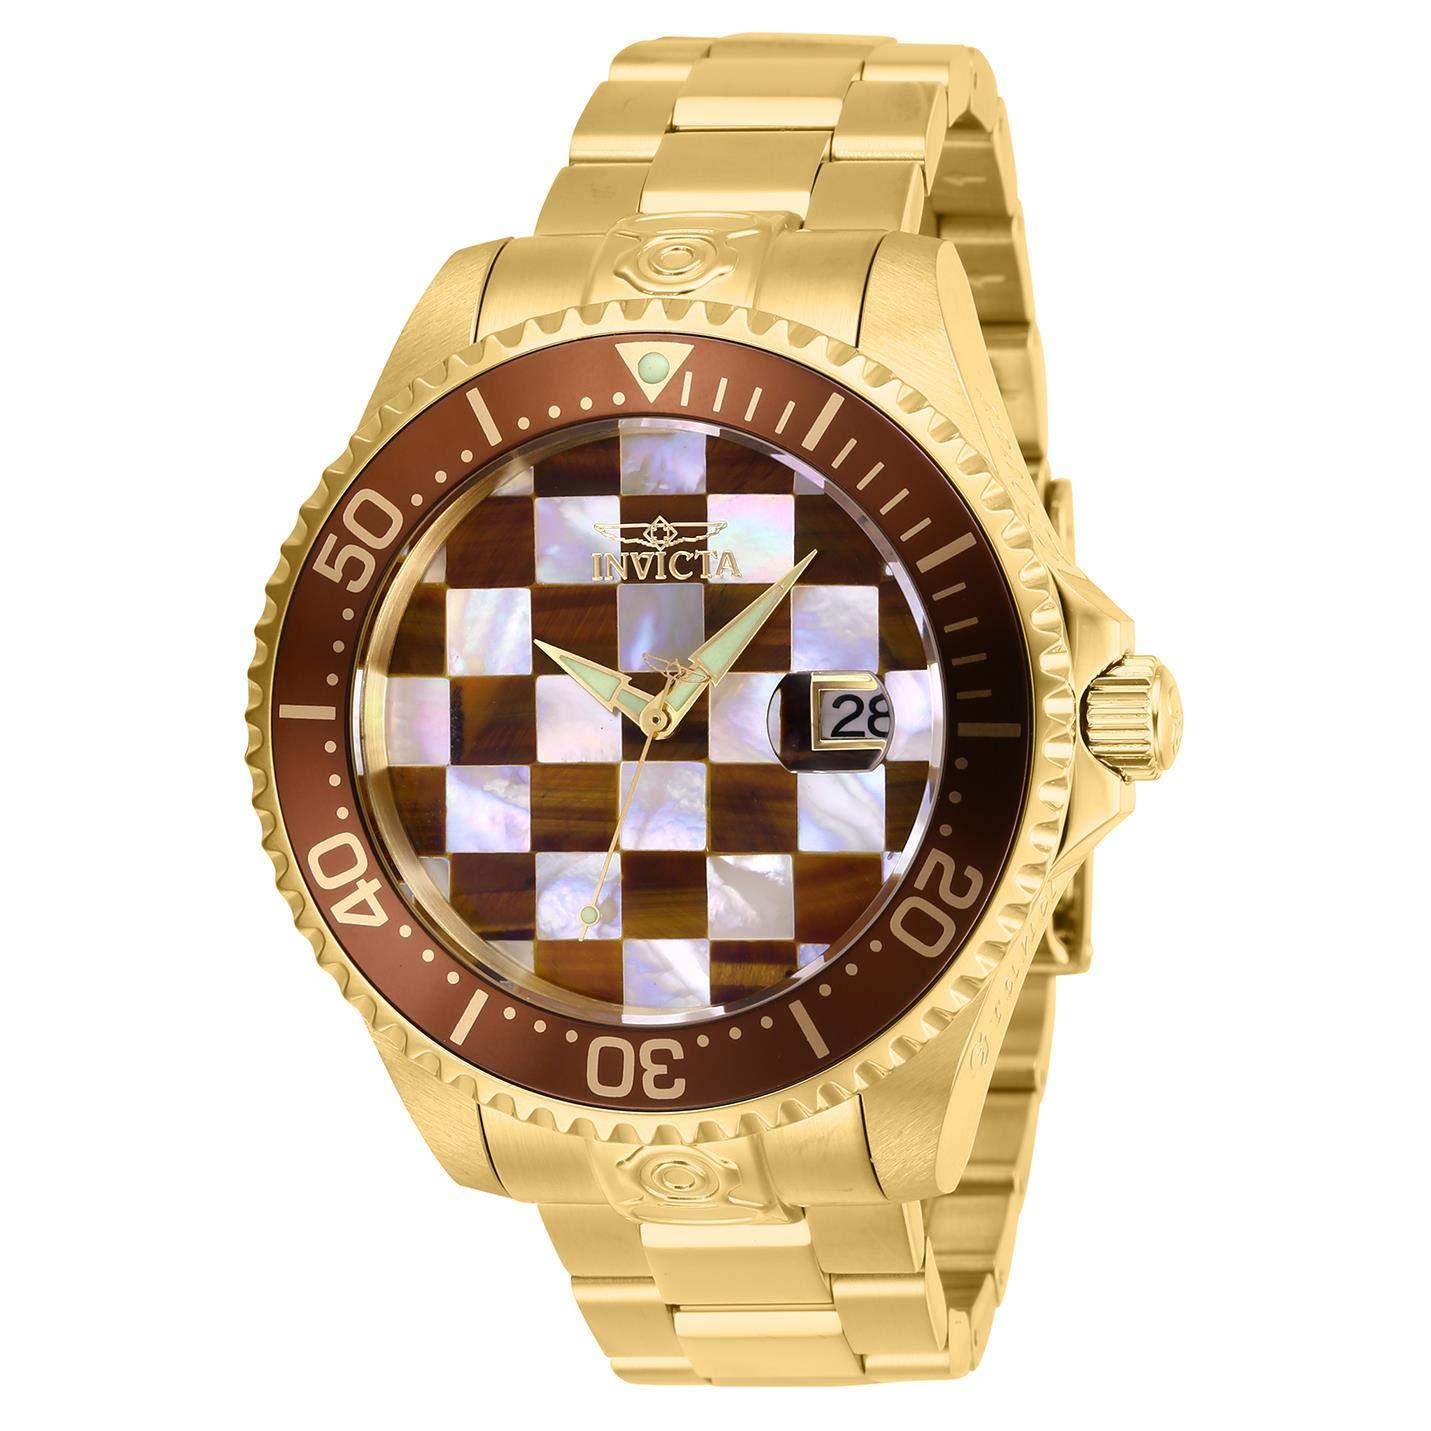 Invicta-Pro-Diver-Herren-Armbanduhr-Armband-Edelstahl-Gold-Automatik-27775